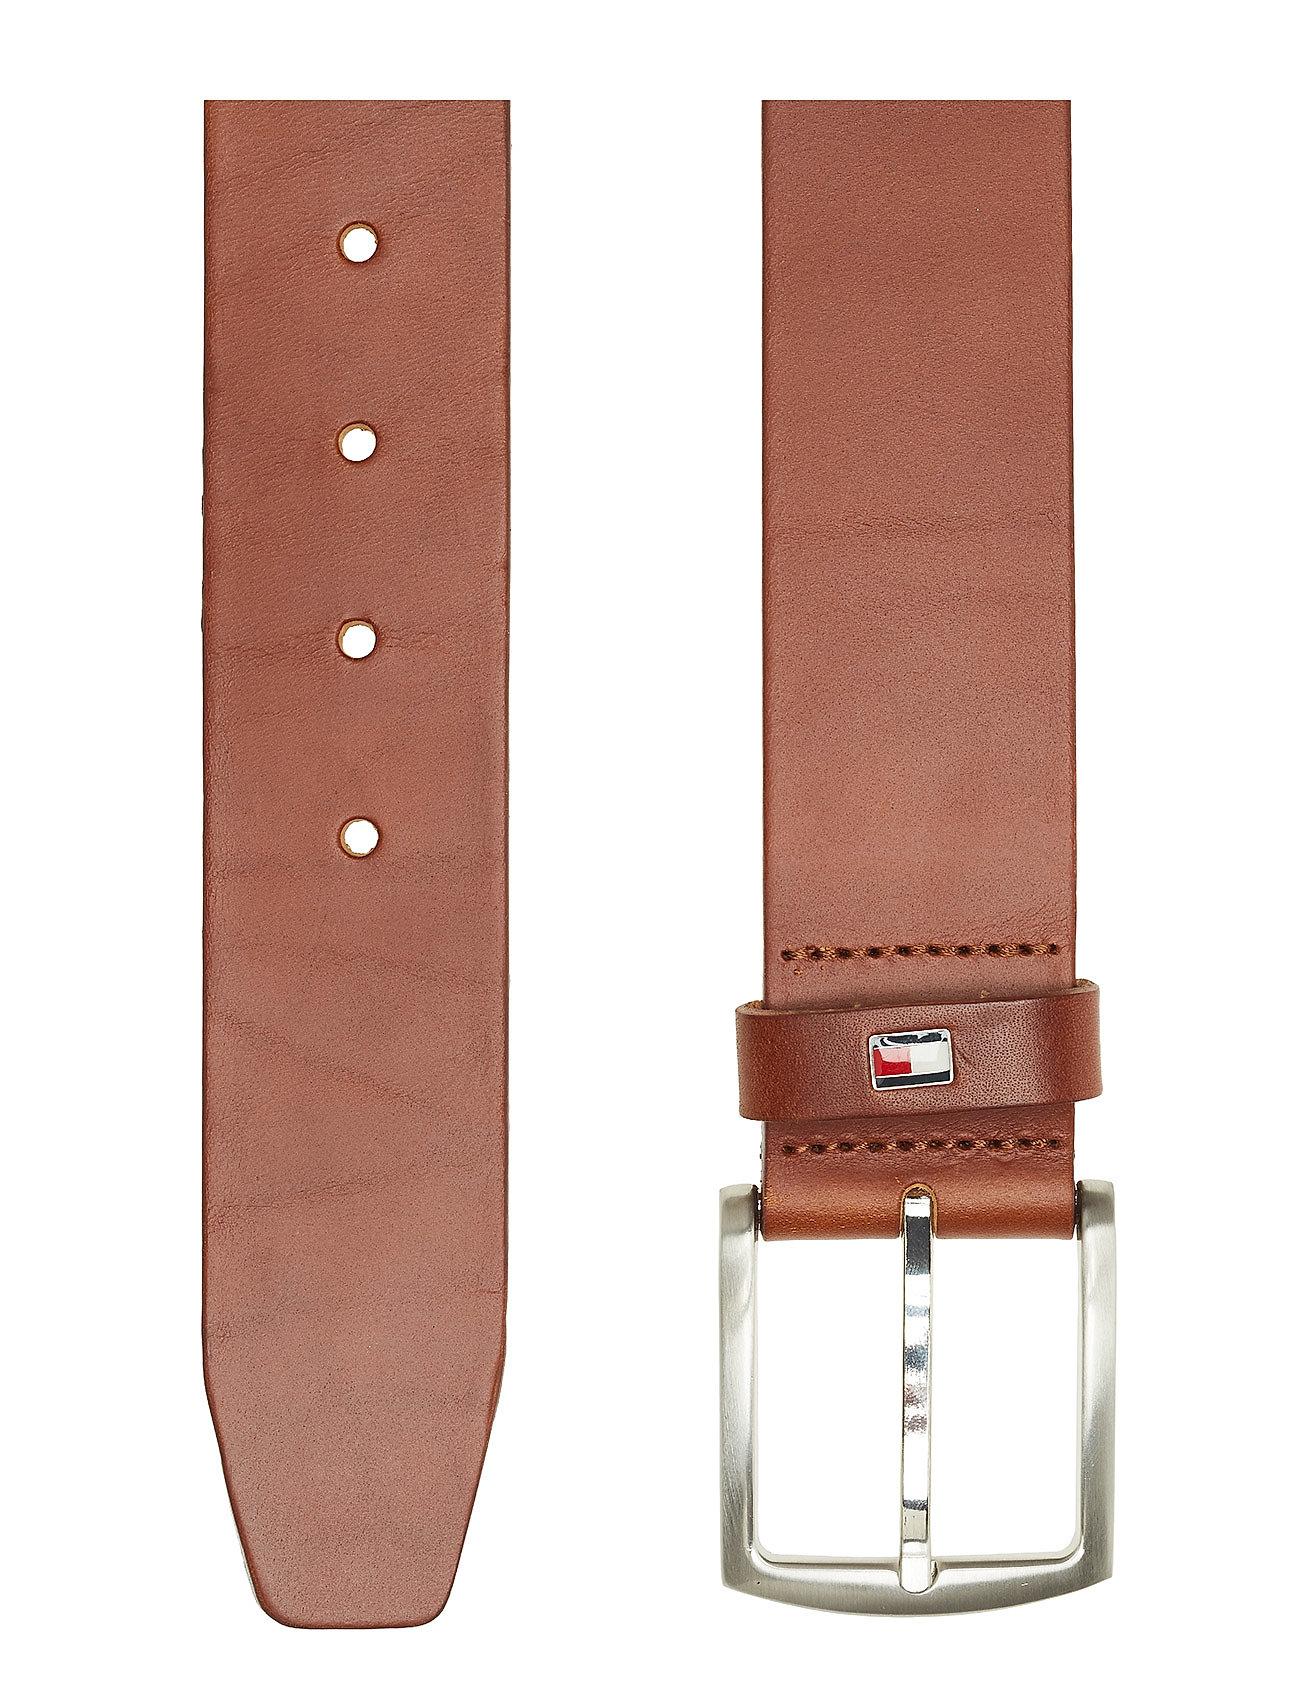 New Denton Belt 4.0, Accessories Belts Classic Belts Brun Tommy Hilfiger